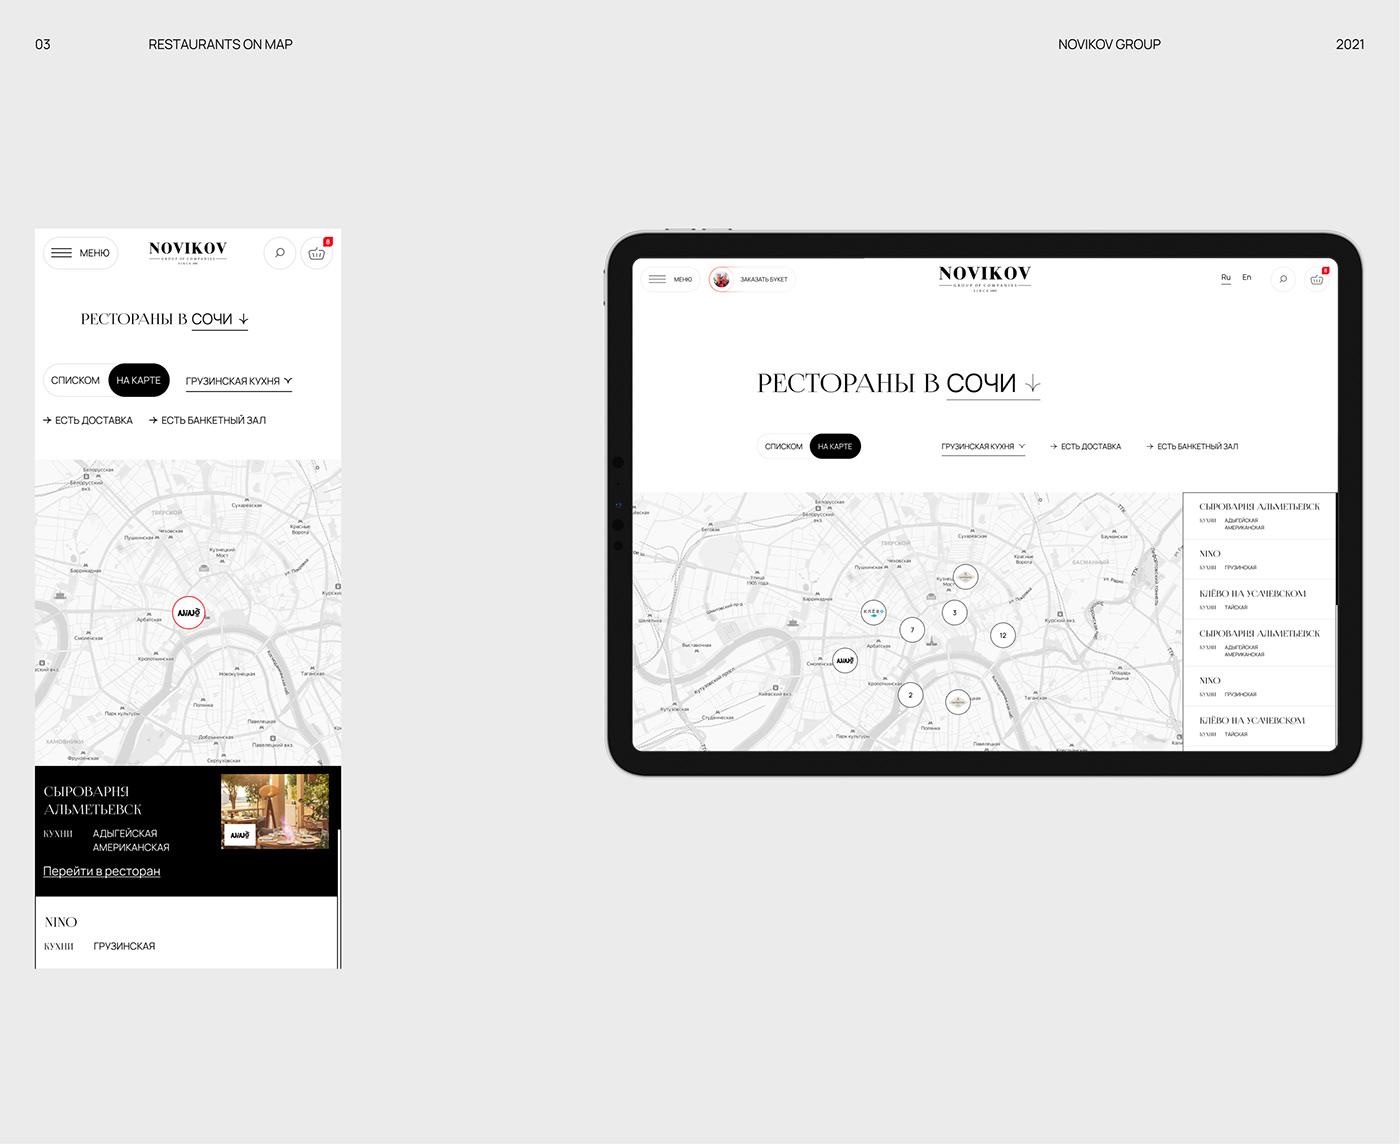 cafe design grid luxury modern restaurant app delivery Food  typography